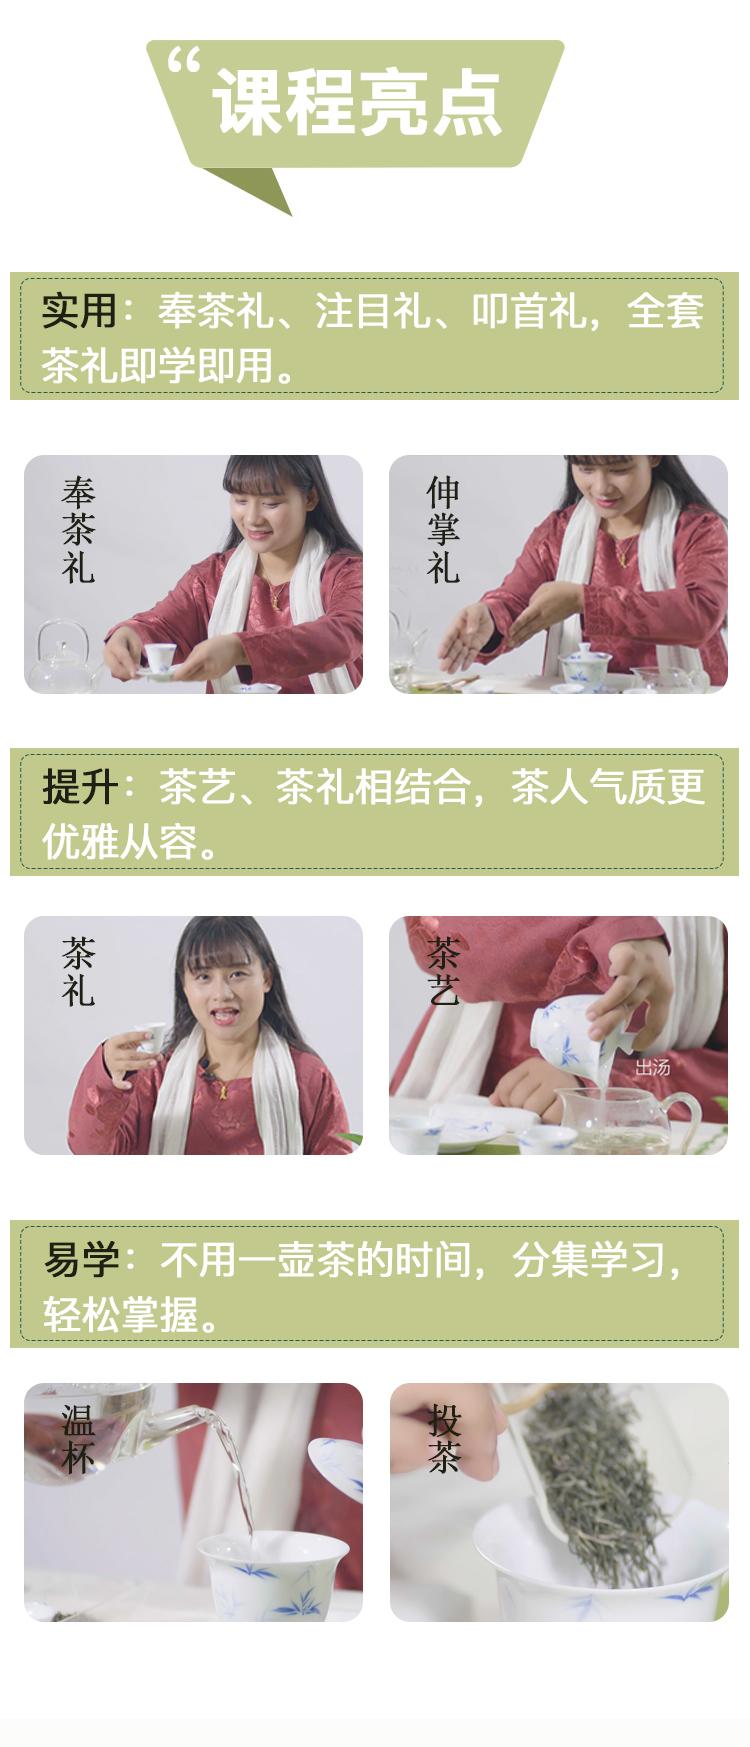 茶艺礼仪-_06